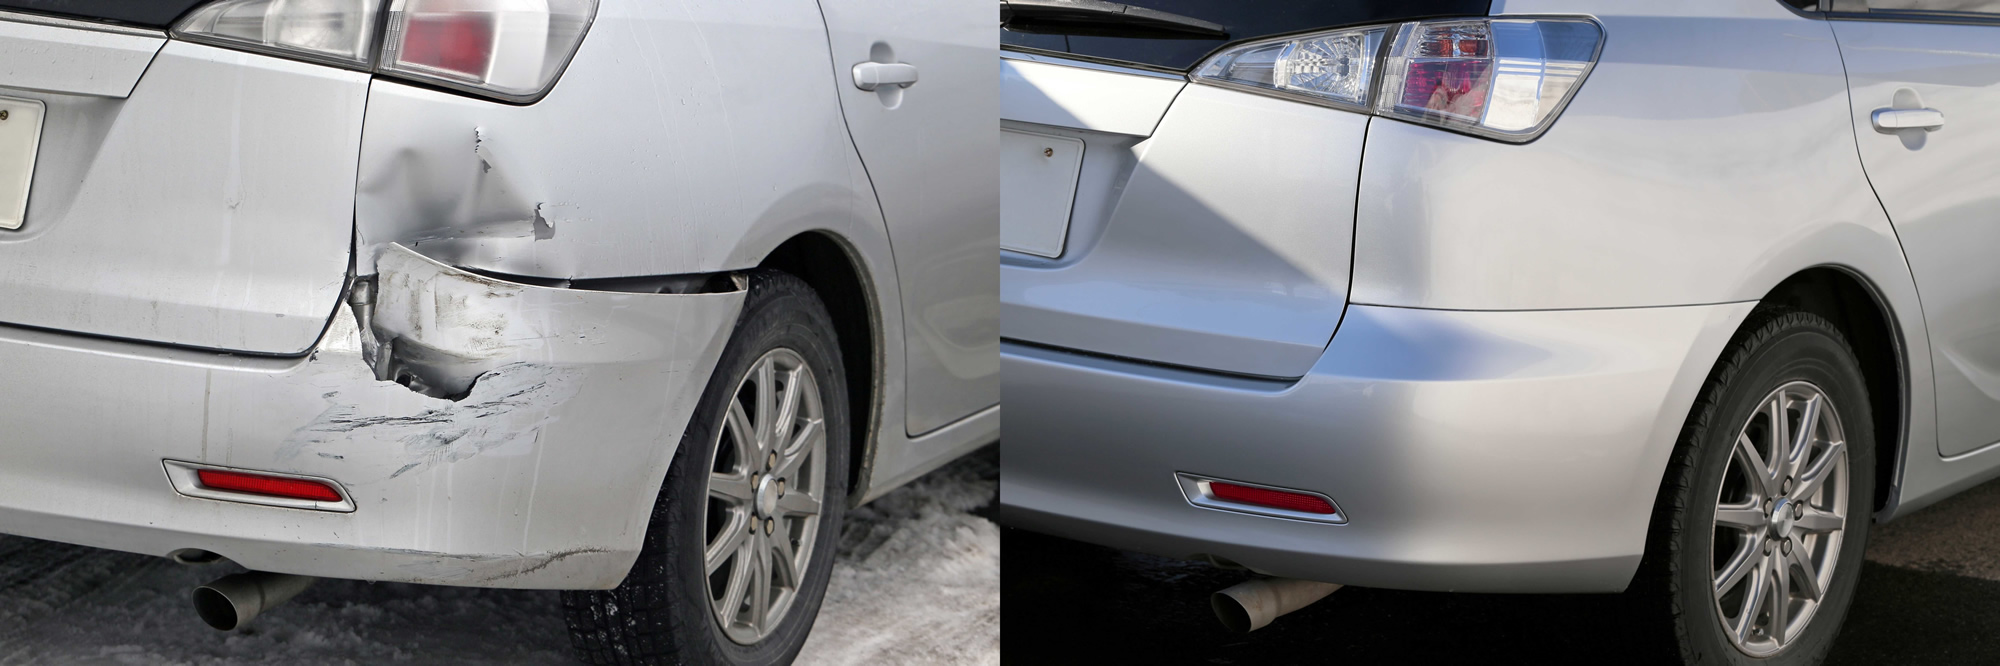 auto-repair-baltimore-md